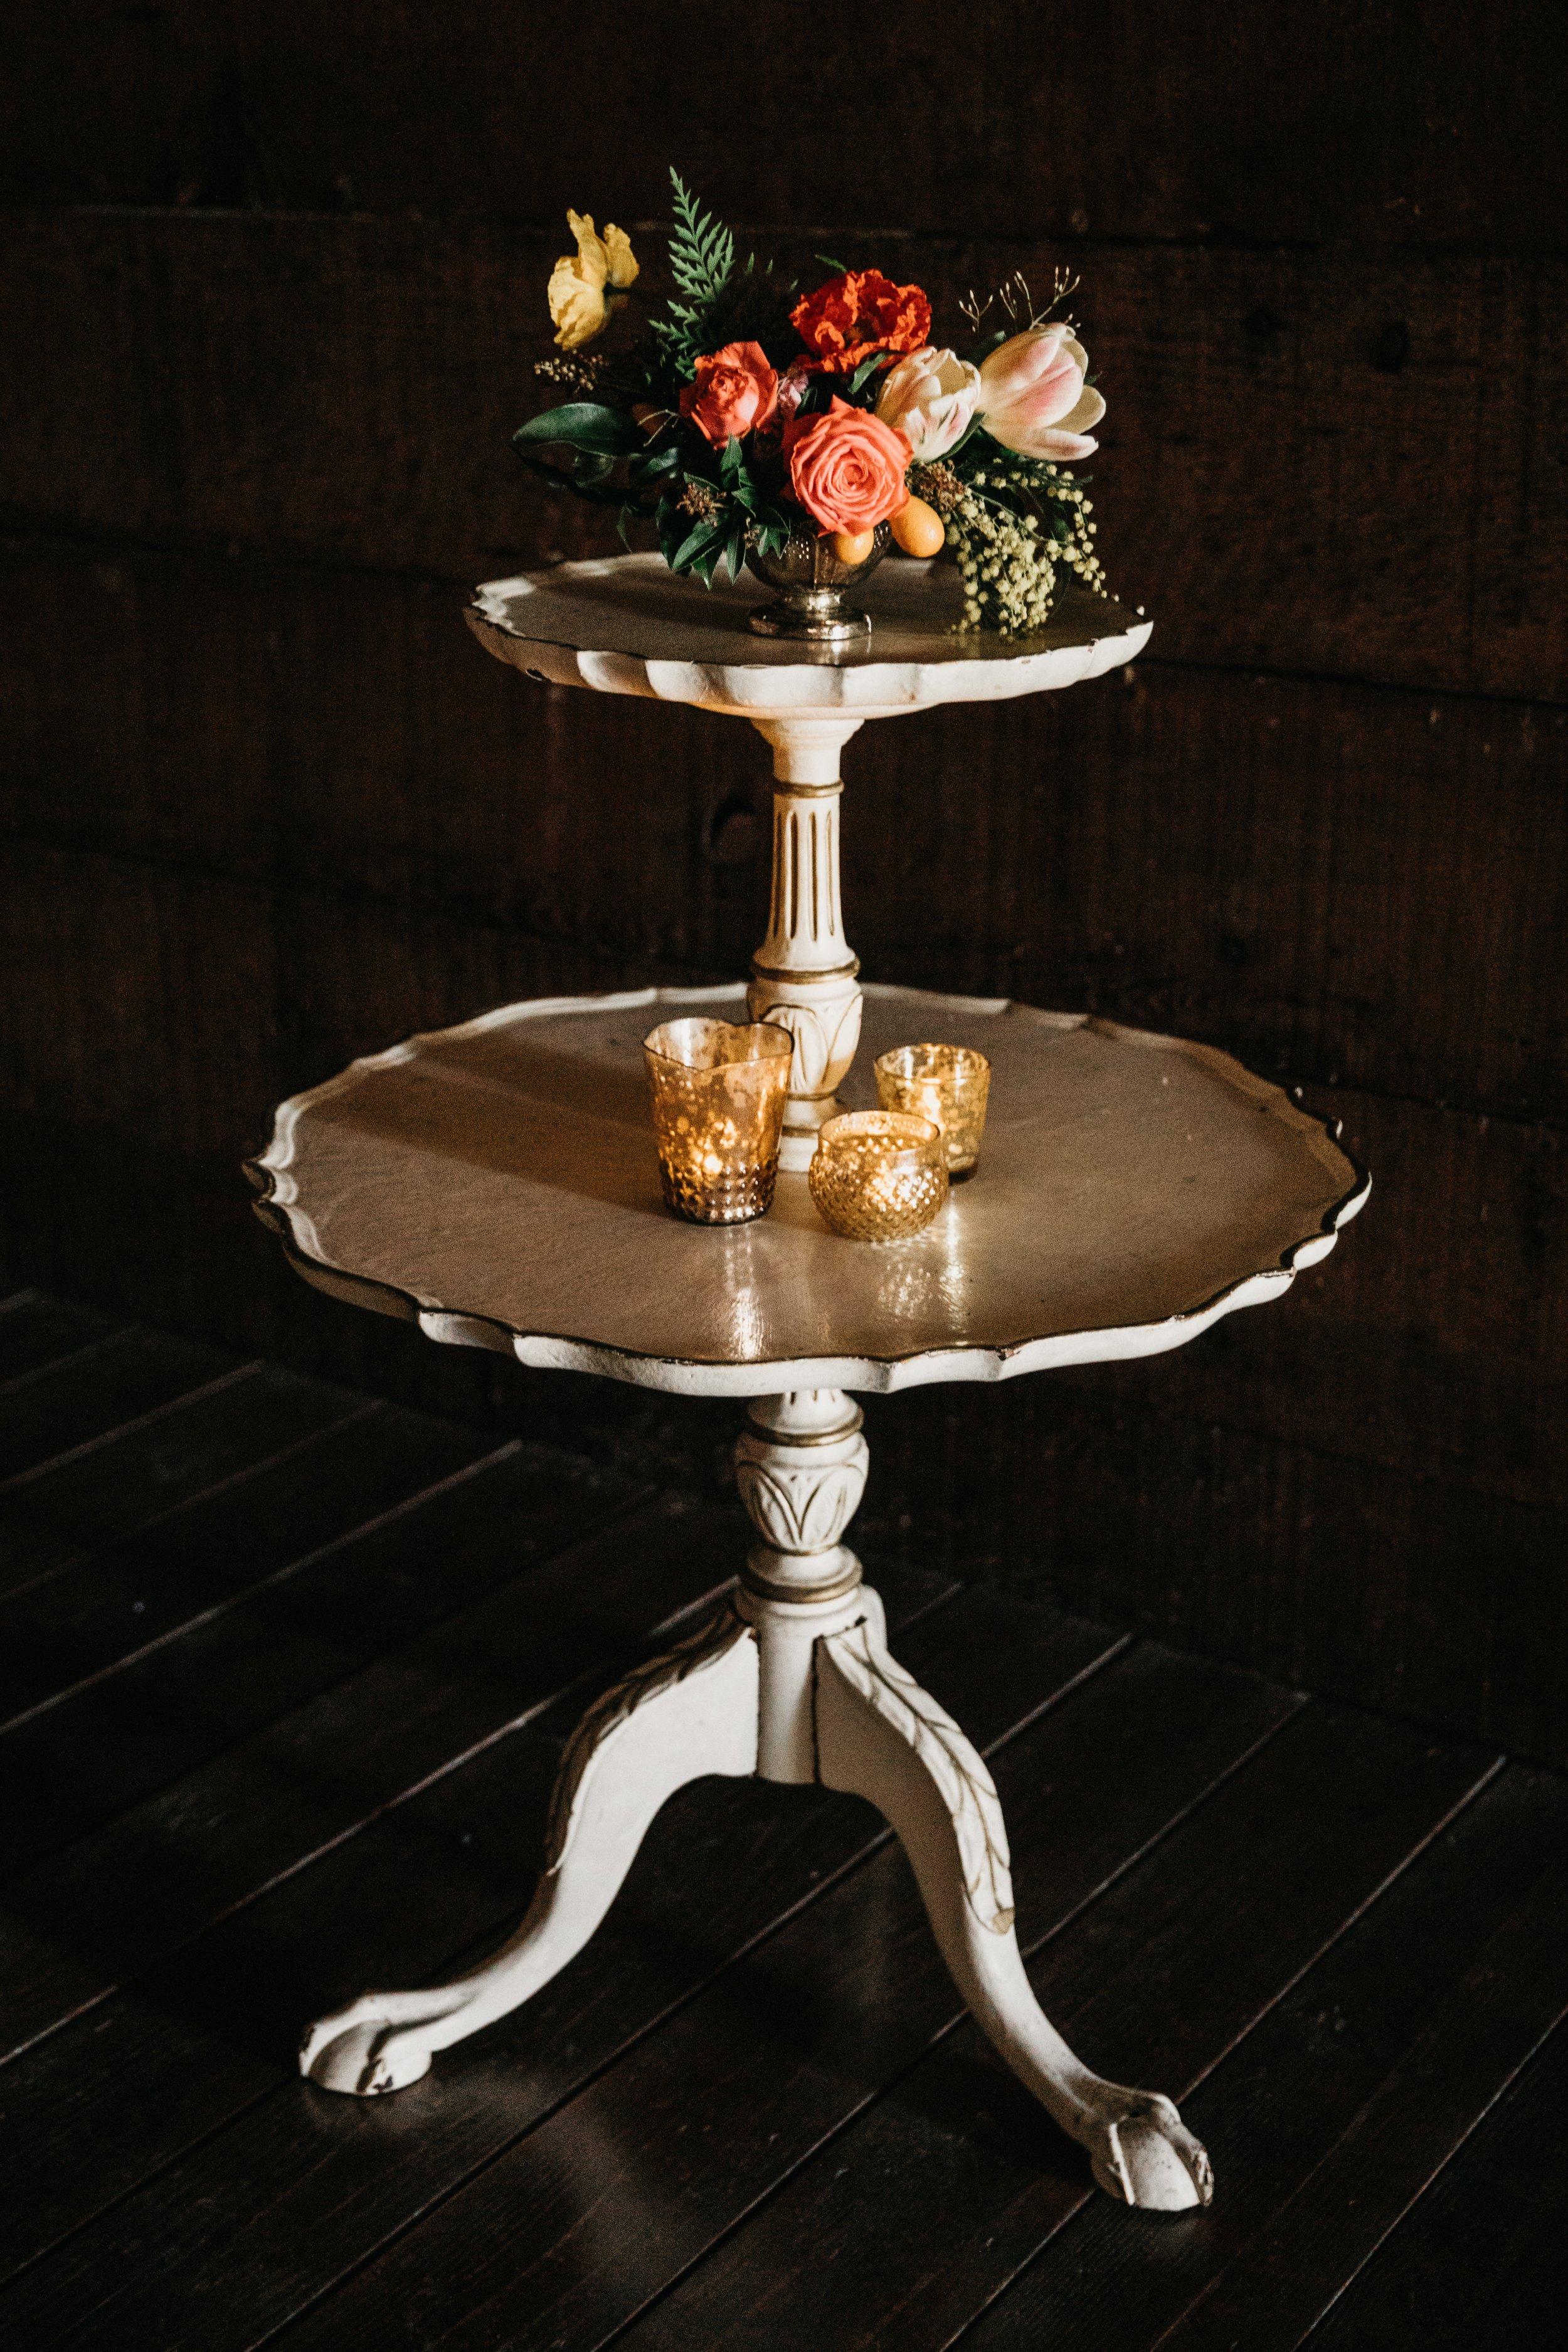 etta two-tier side table $55 (qty 1}